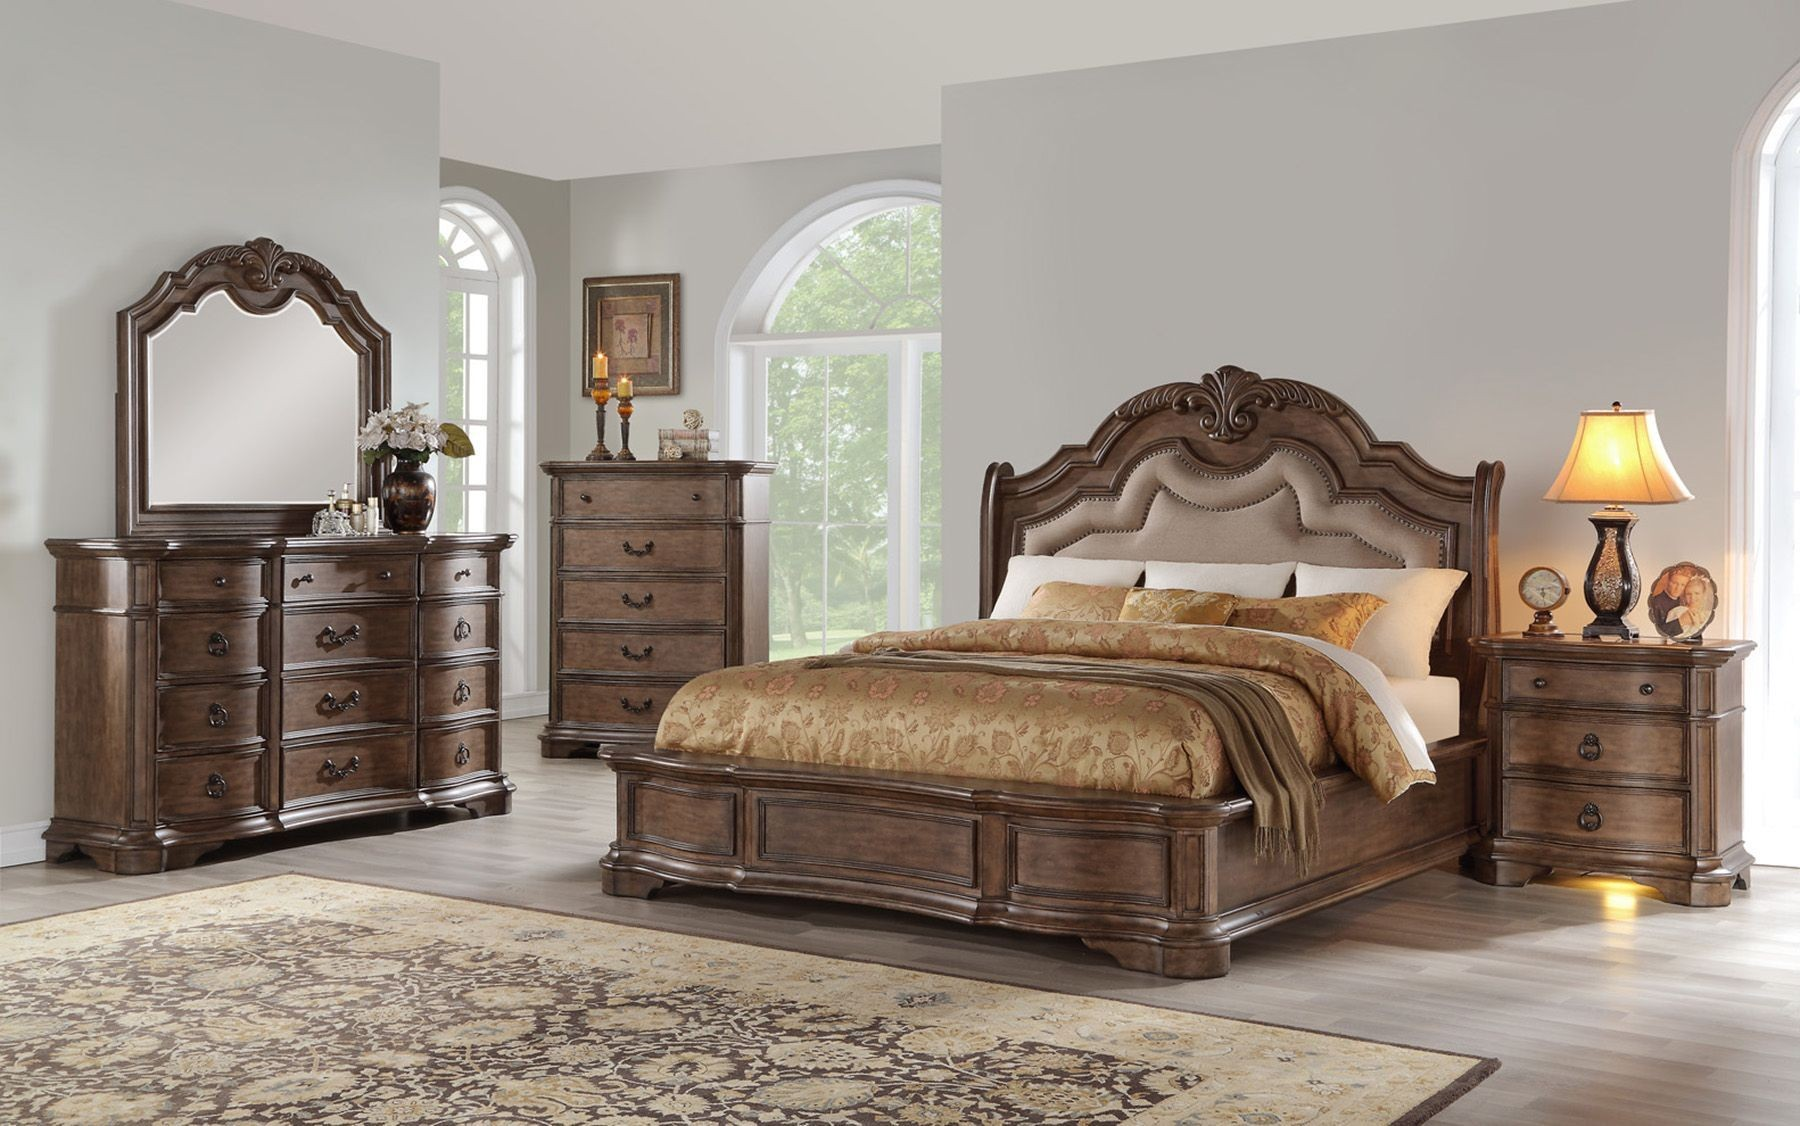 tulsa light sandstone platfrom bedroom set from avalon